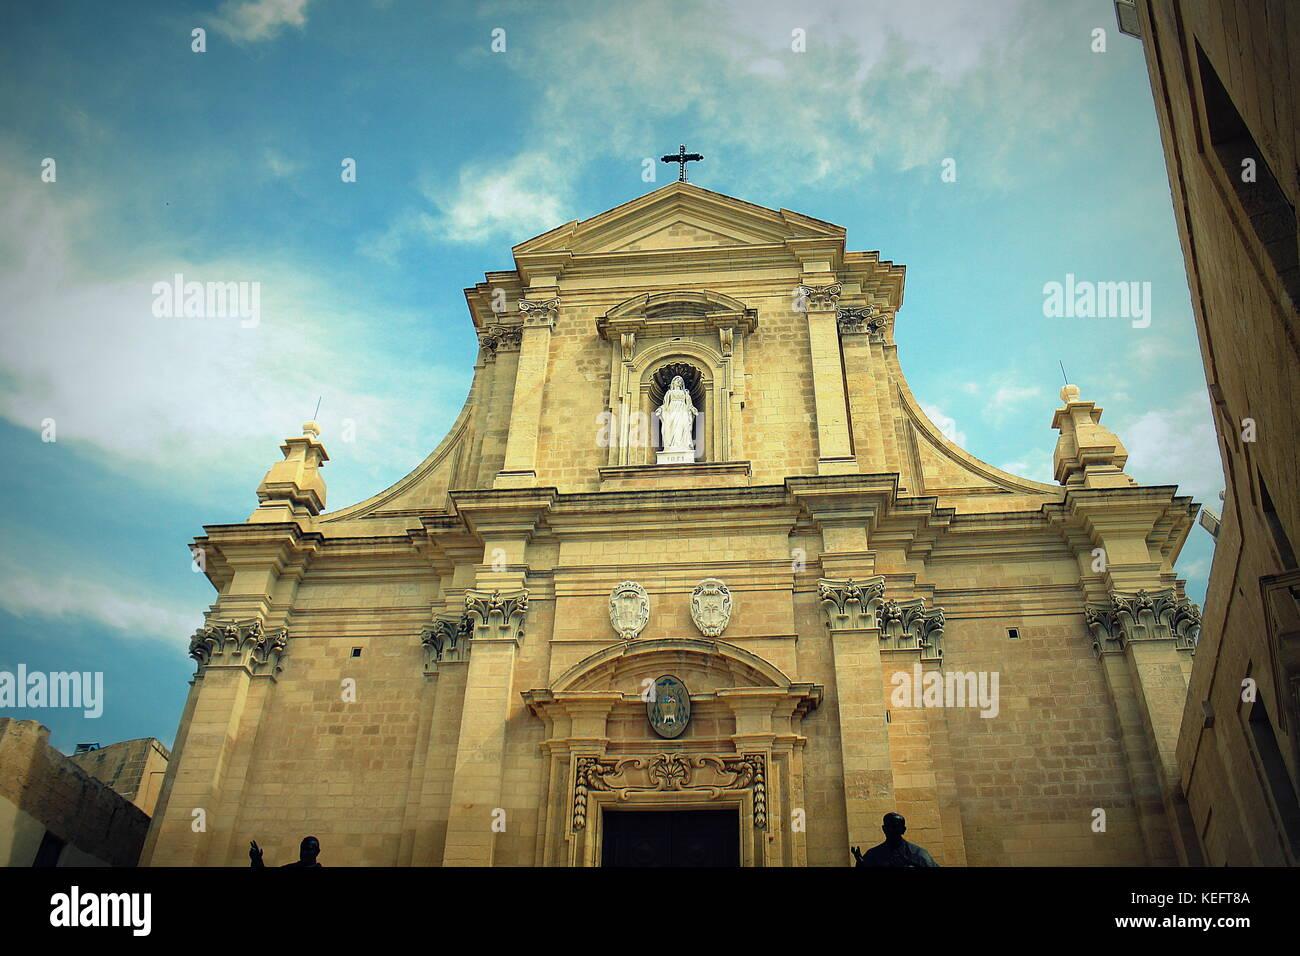 The Gozo Cathedral inside the Citadel of Victoria or Rabat - Victoria, Gozo, Malta - Stock Image